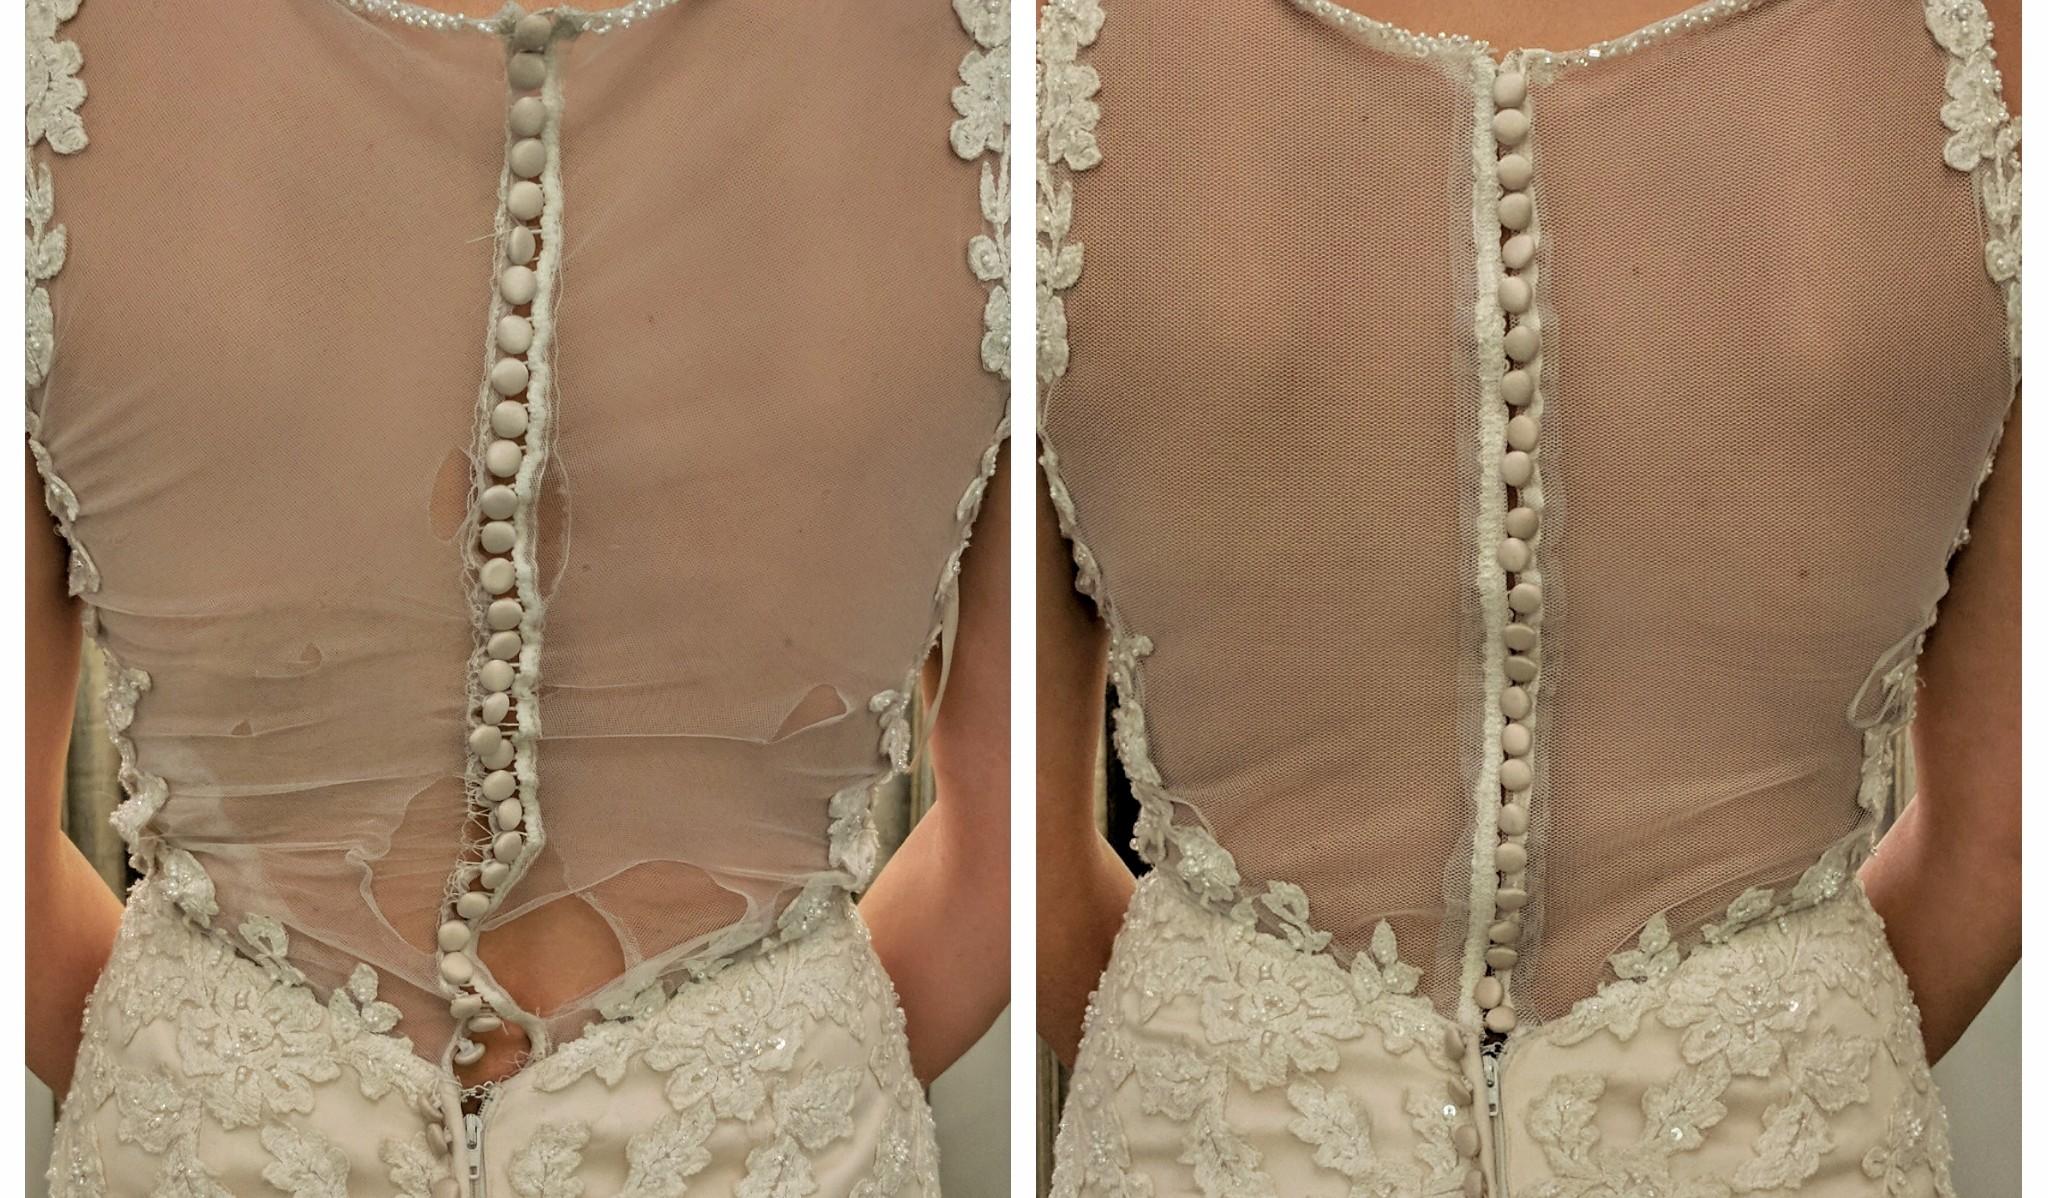 Bridal / Wedding Gown Repairs